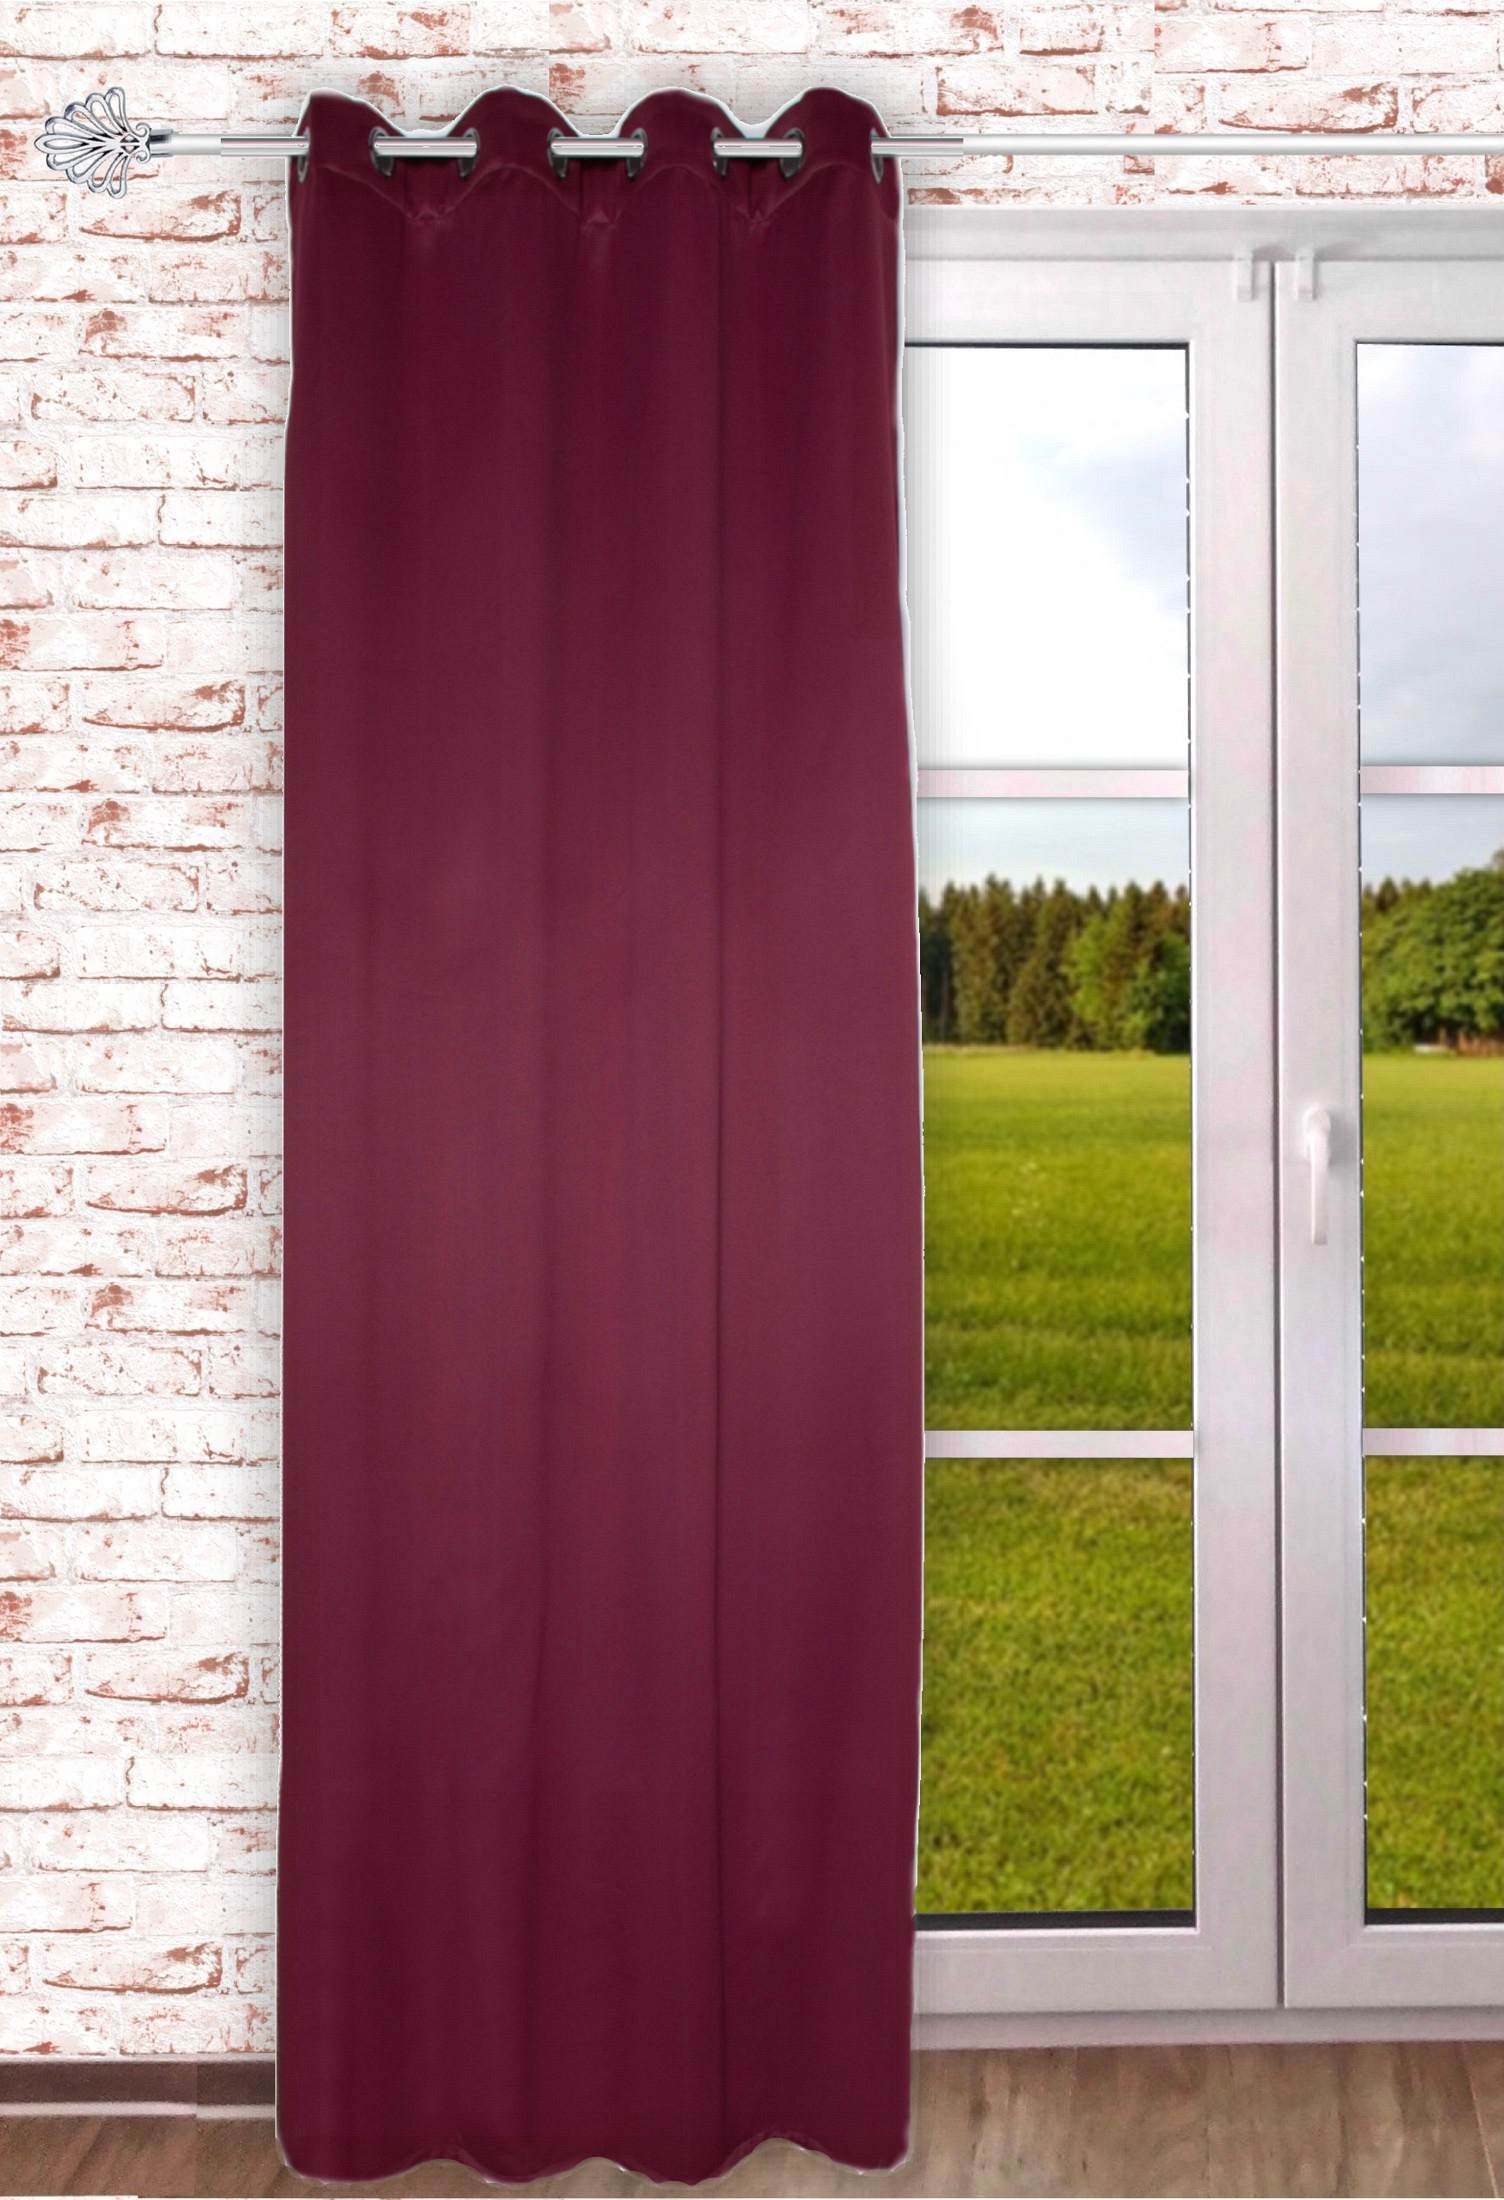 gardinen welt online shop senschal thermostoff thermoblackout verdunkelnd rot 135x245cm. Black Bedroom Furniture Sets. Home Design Ideas